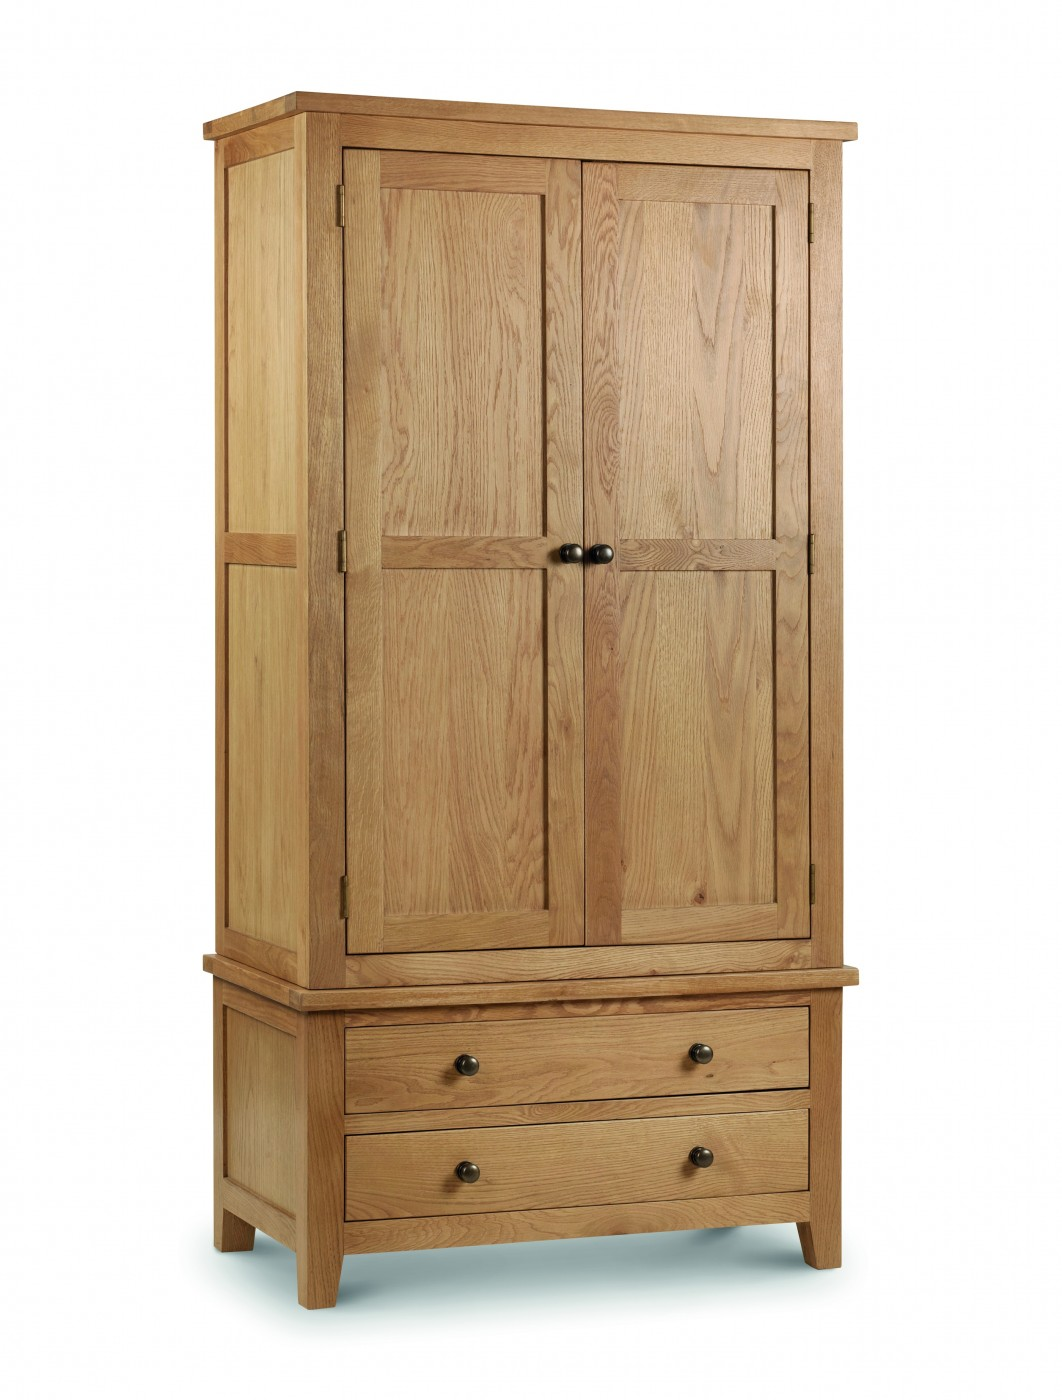 Wonderful Home  Storage  Wardrobe Cabinets  New Laminate Wardrobe Cabinet